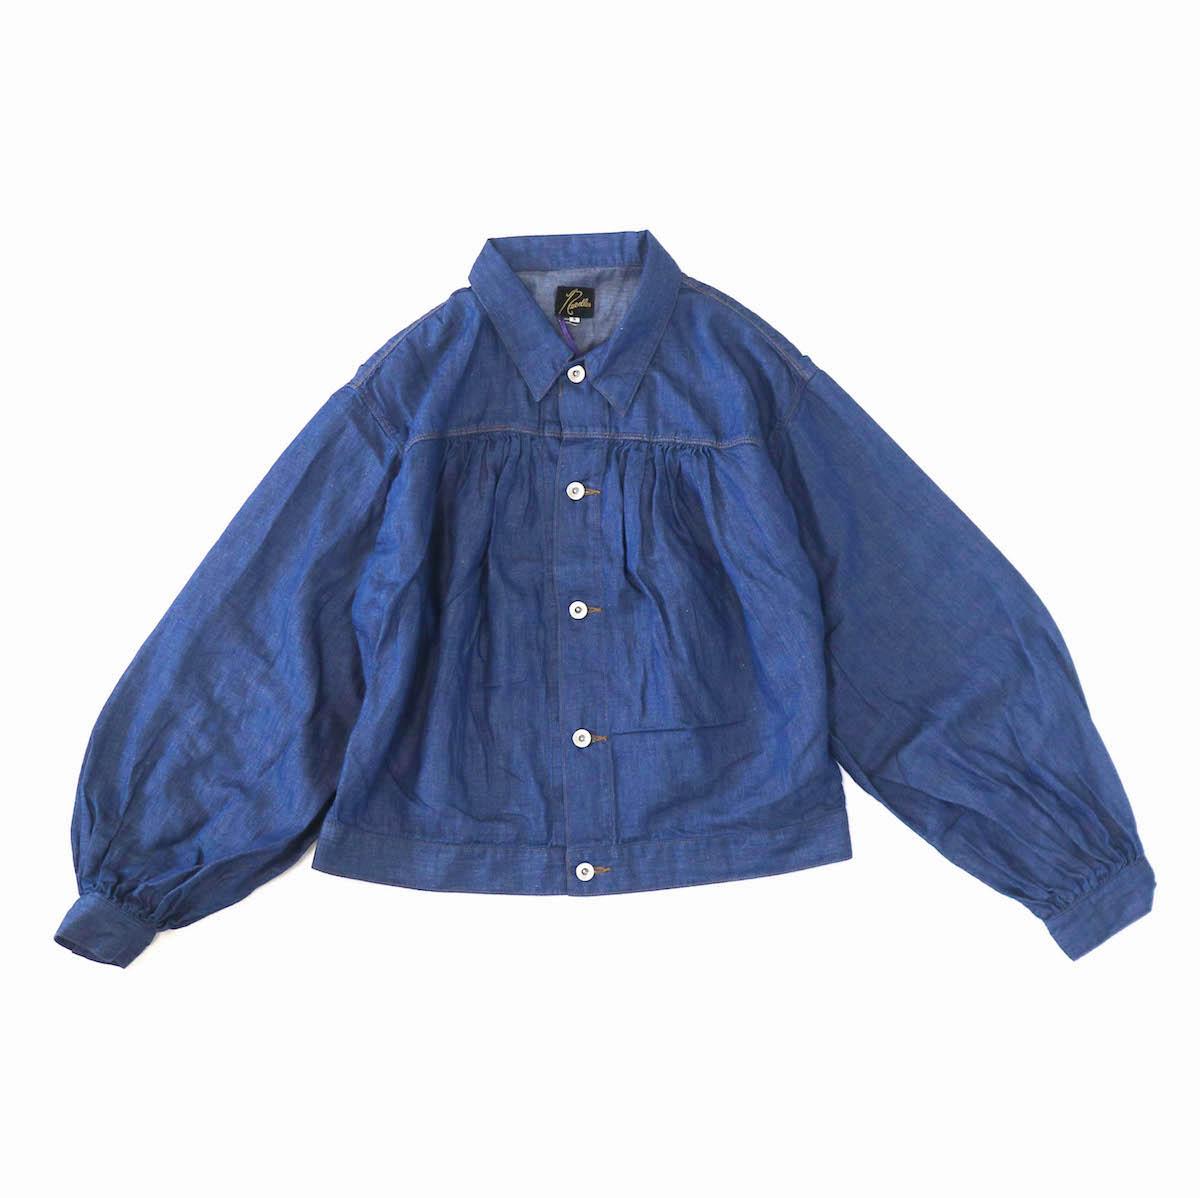 NEEDLES / Gathered Jean Jacket -6.5oz C/L Denim -indigo